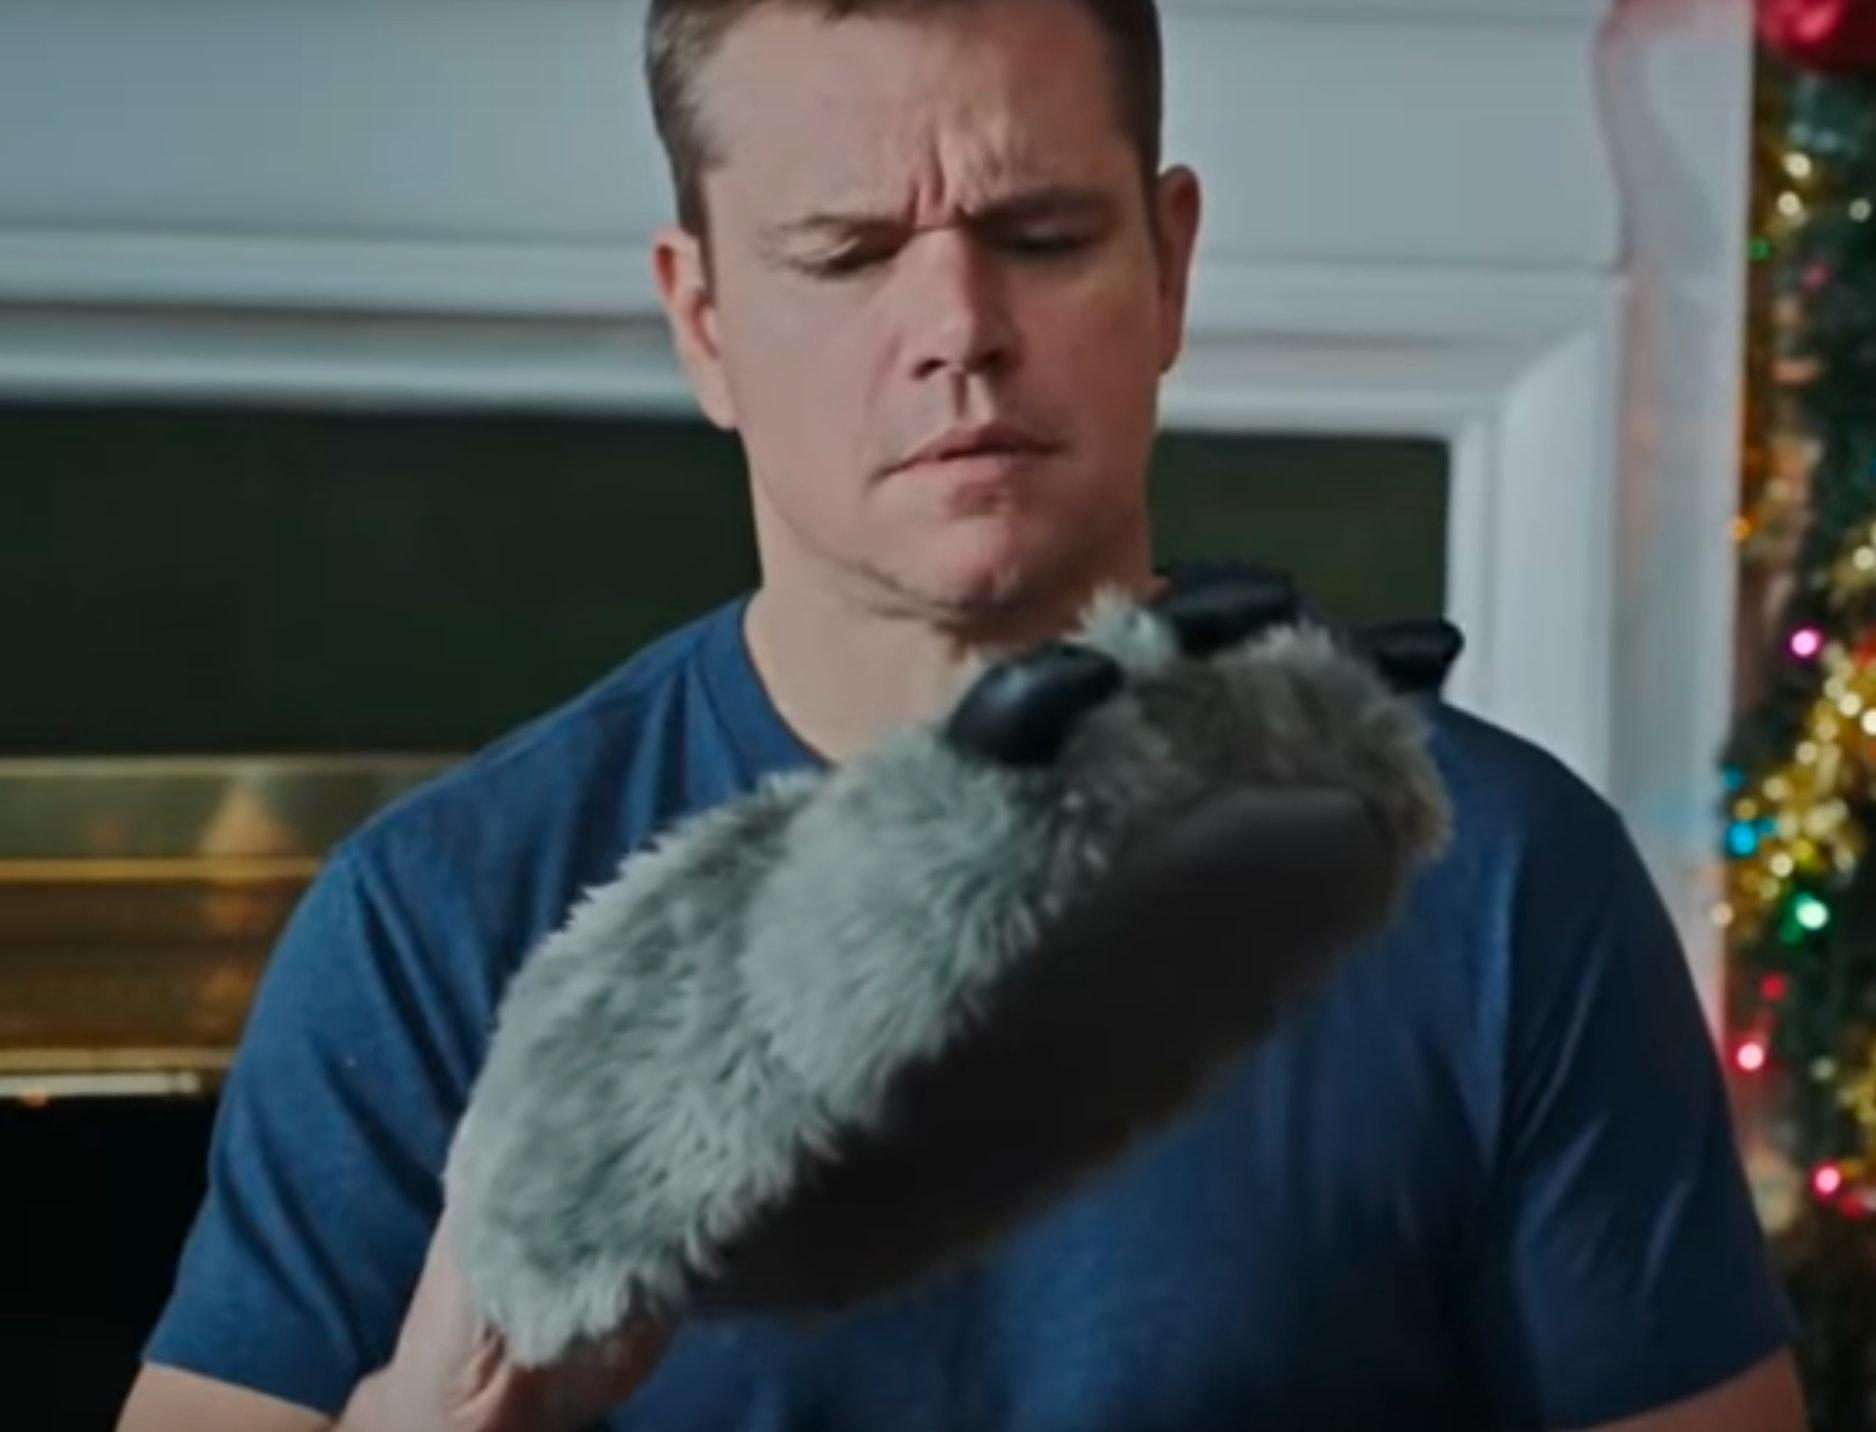 Best Christmas Ever Snl.Matt Damon S Snl Skit About Christmas Will Hilariously Hit